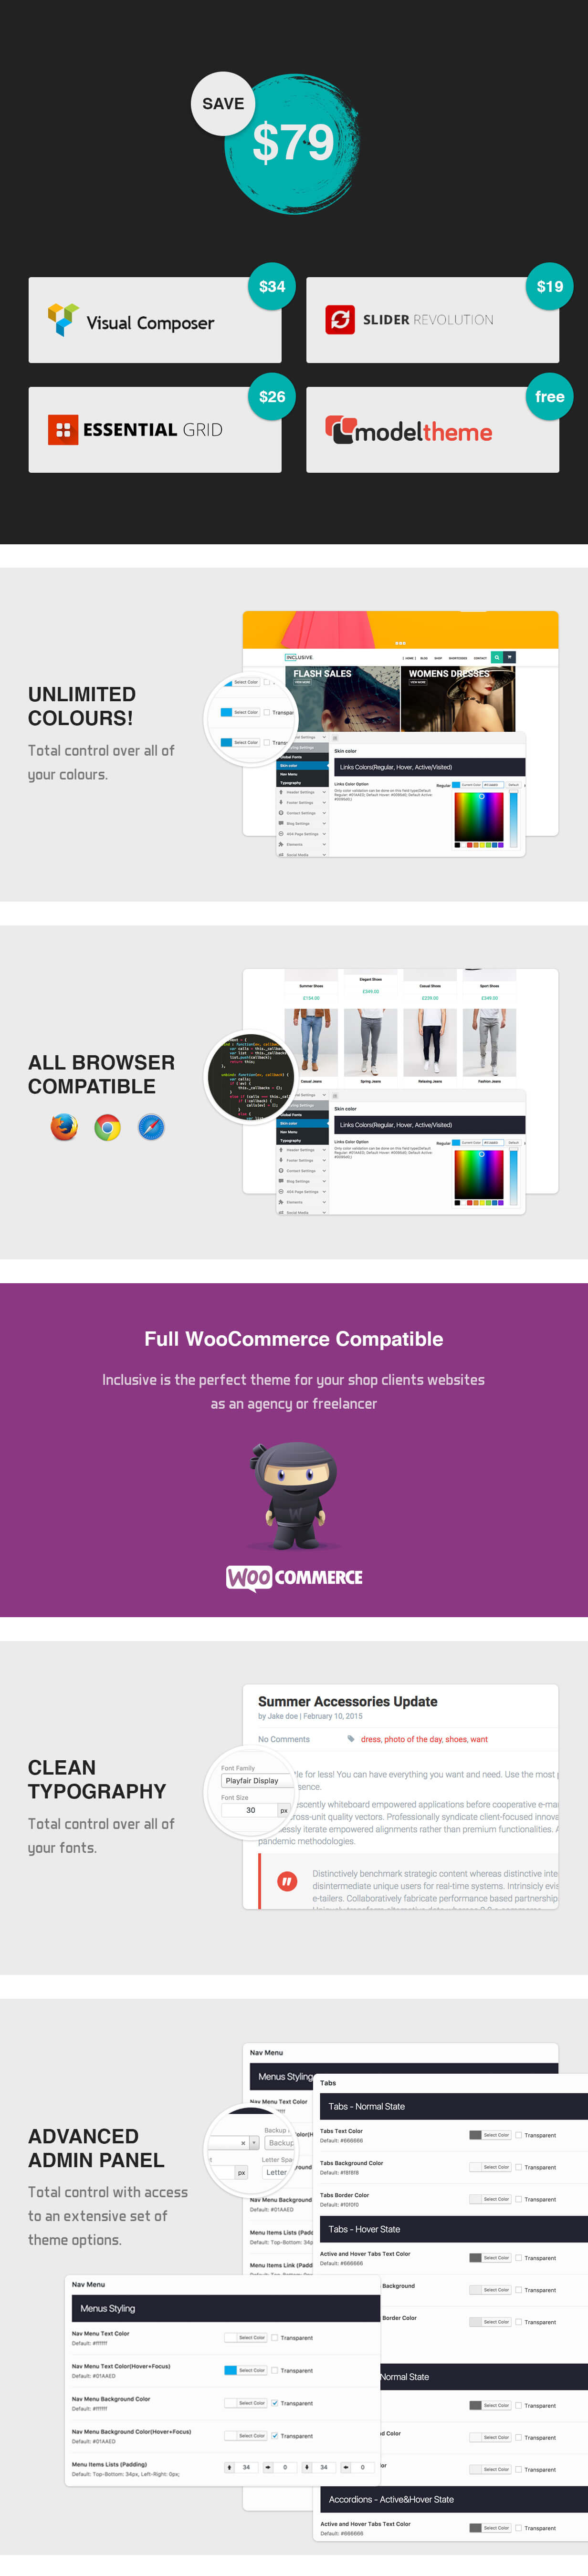 Inklusive - WooCommerce-Mehrzweck-WordPress-Vorlage - 5